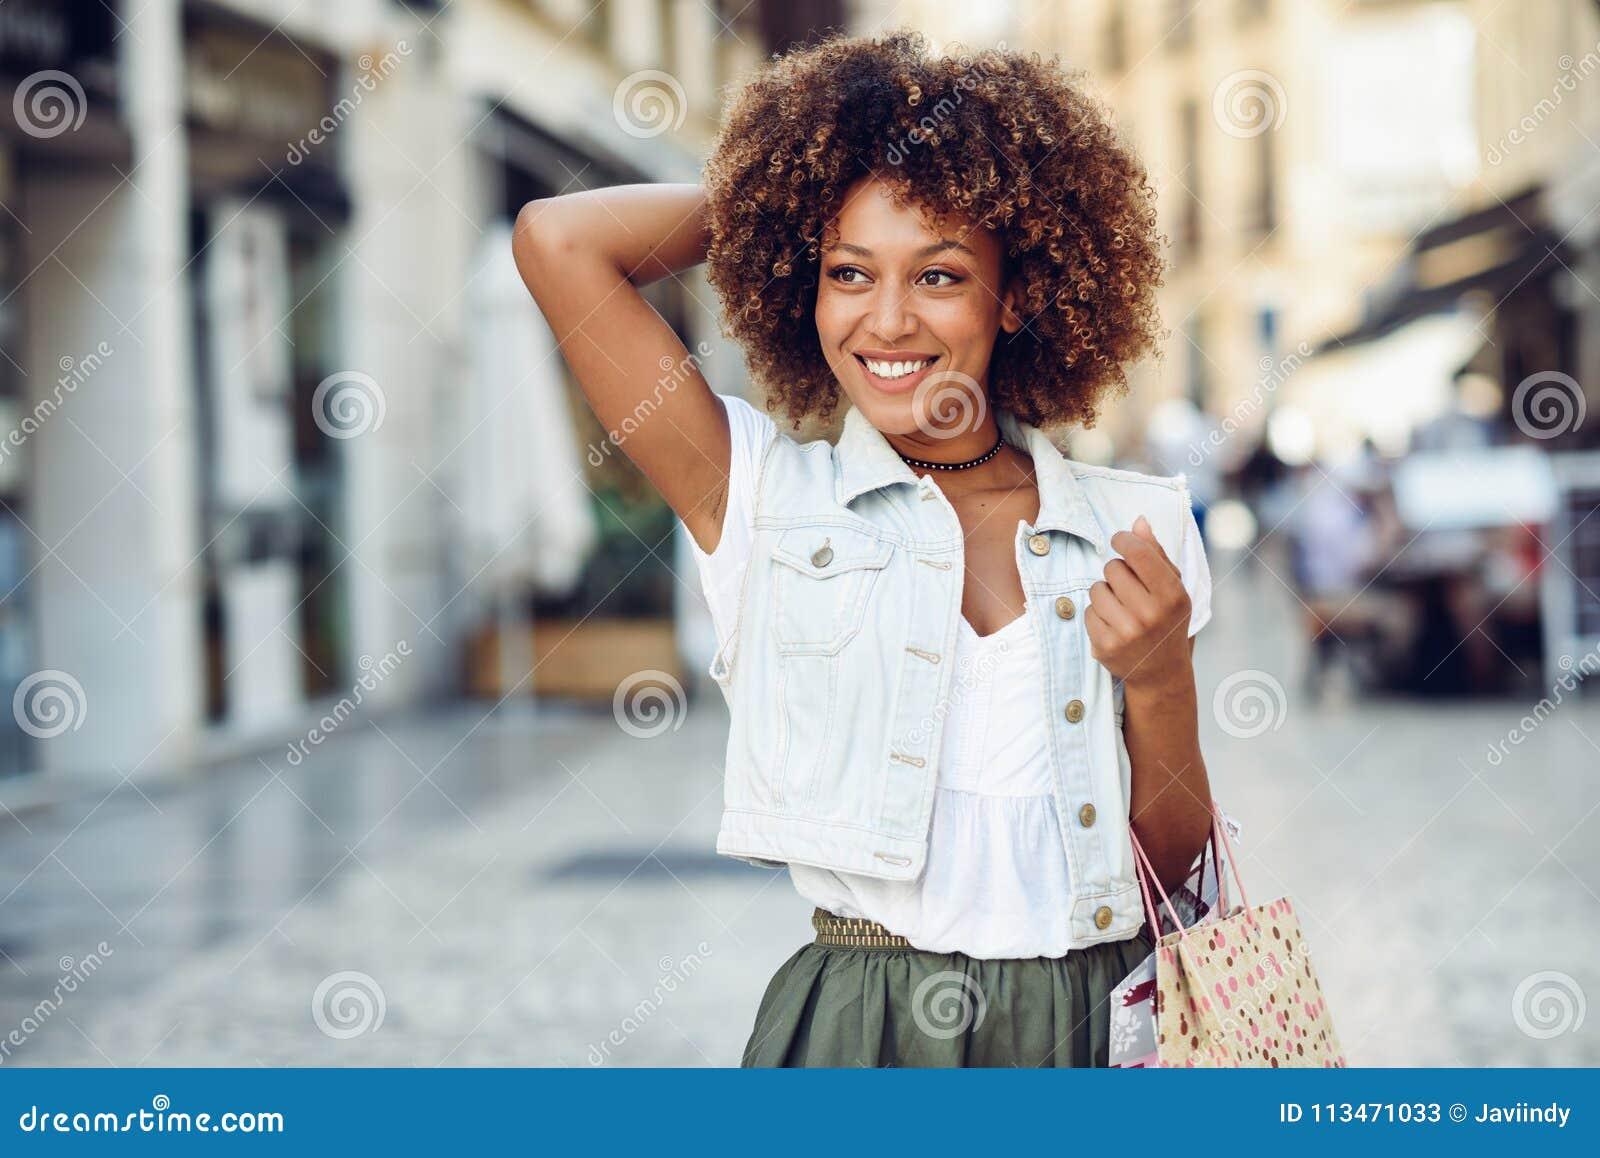 Svart kvinna afro frisyr, med shoppingpåsar i gatan